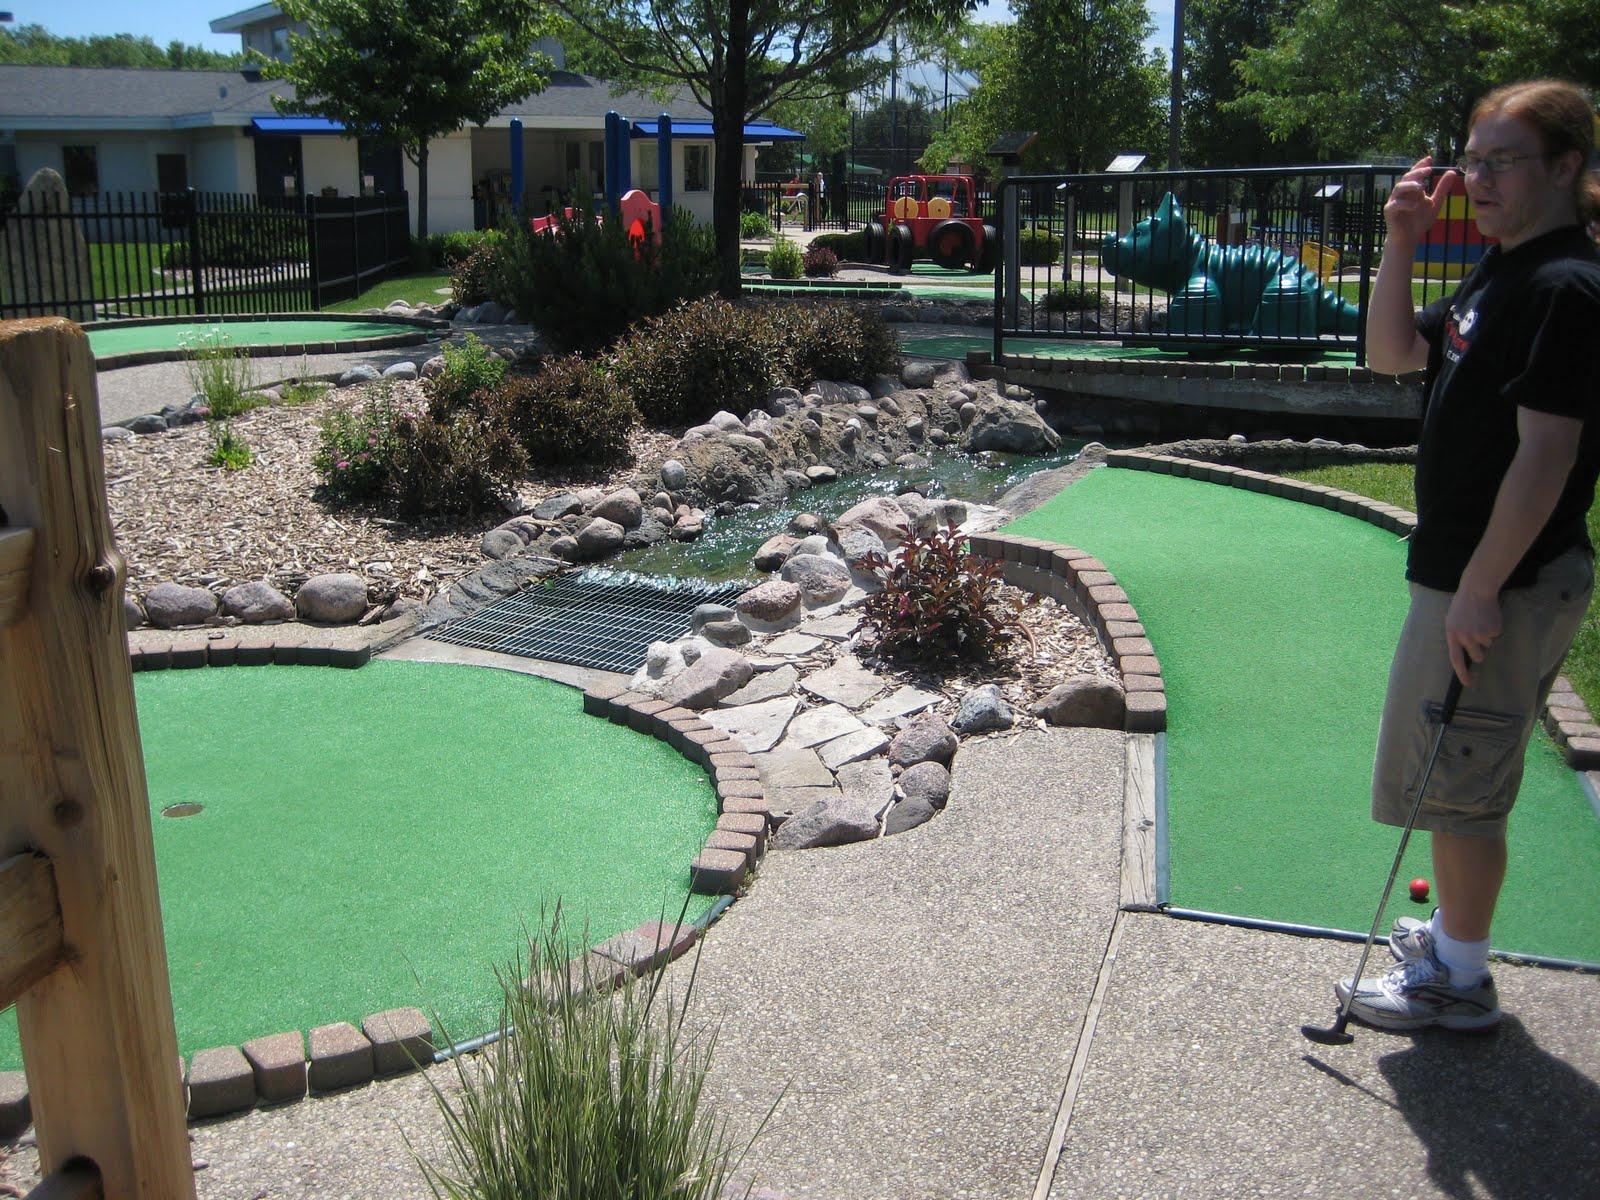 the mini golf diaries skokie sports park part 1 kid s quest the mini golf diaries blogger